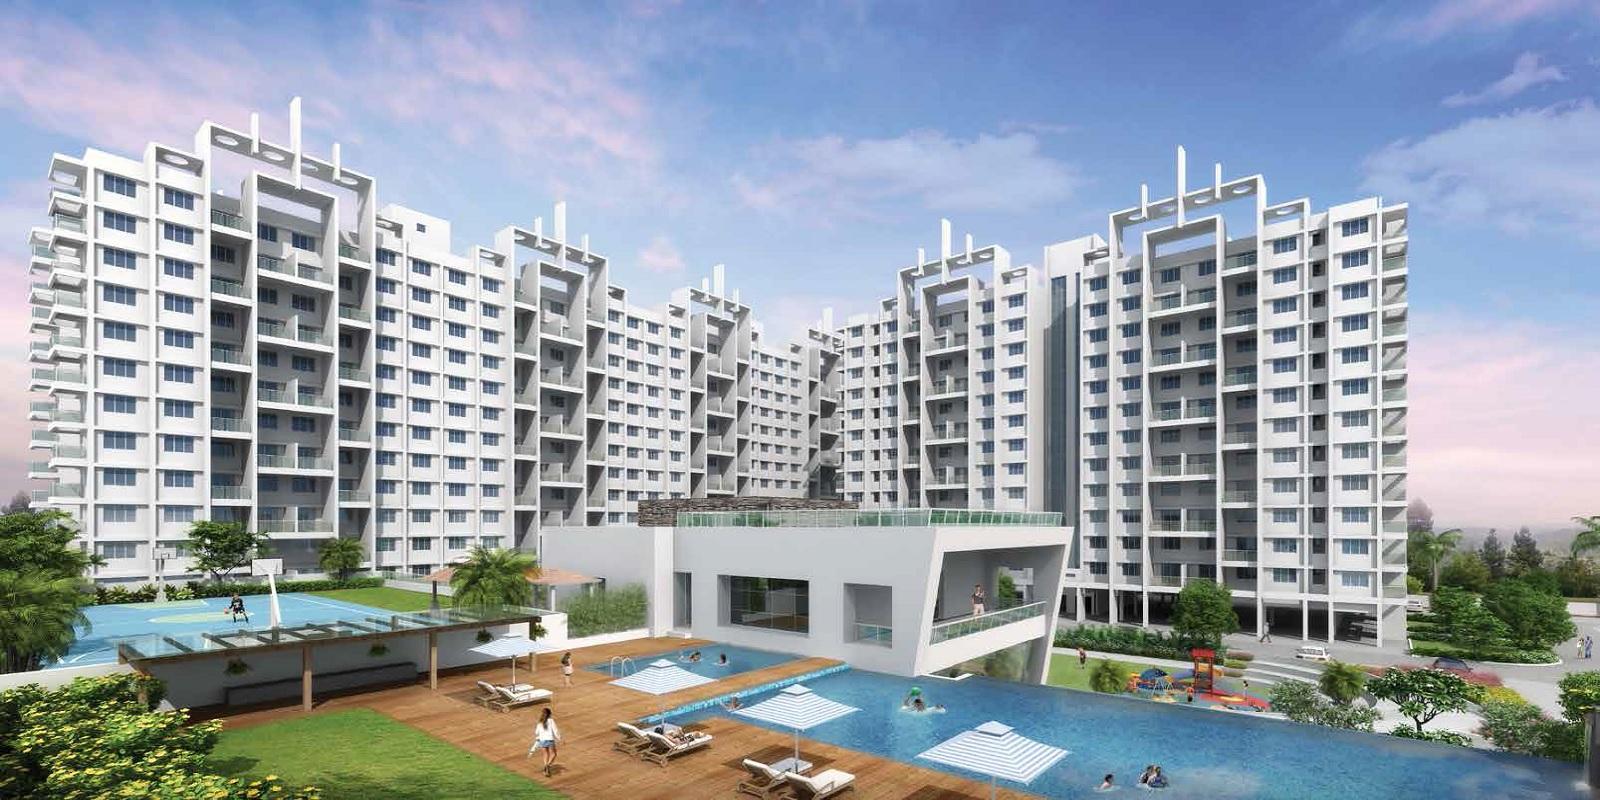 ganga glitz shine project amenities features5